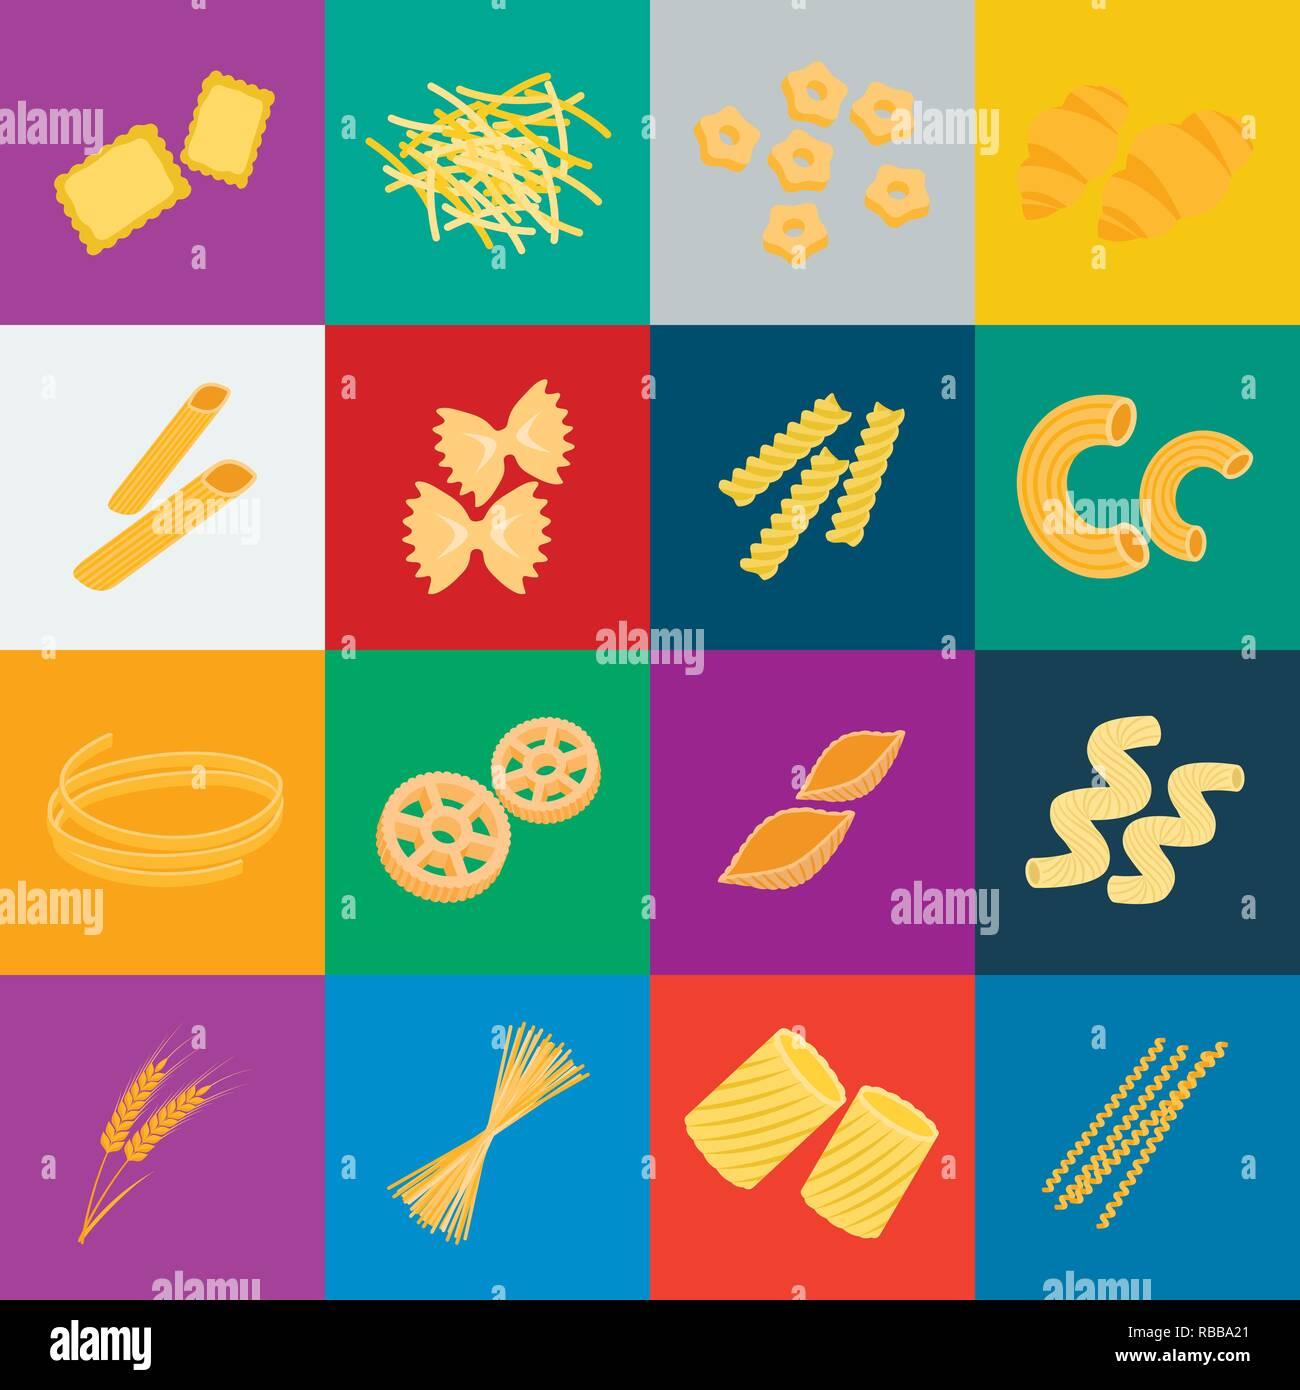 art,bucati,carbohydrate,cartoon,cavatappi,cereal,chifferi,collection,conchiglie,design,ditalini,dough,ears,farfalle,figured,filini,food,fusilli,gnocchi,icon,illustration,isolated,logo,macaroni,pasta,penne,product,ravioli,rigate,rotelle,set,shape,sign,spaghetti,stelline,symbol,tagliatelle,types,vector,web,wheat Vector Vectors , Stock Vector